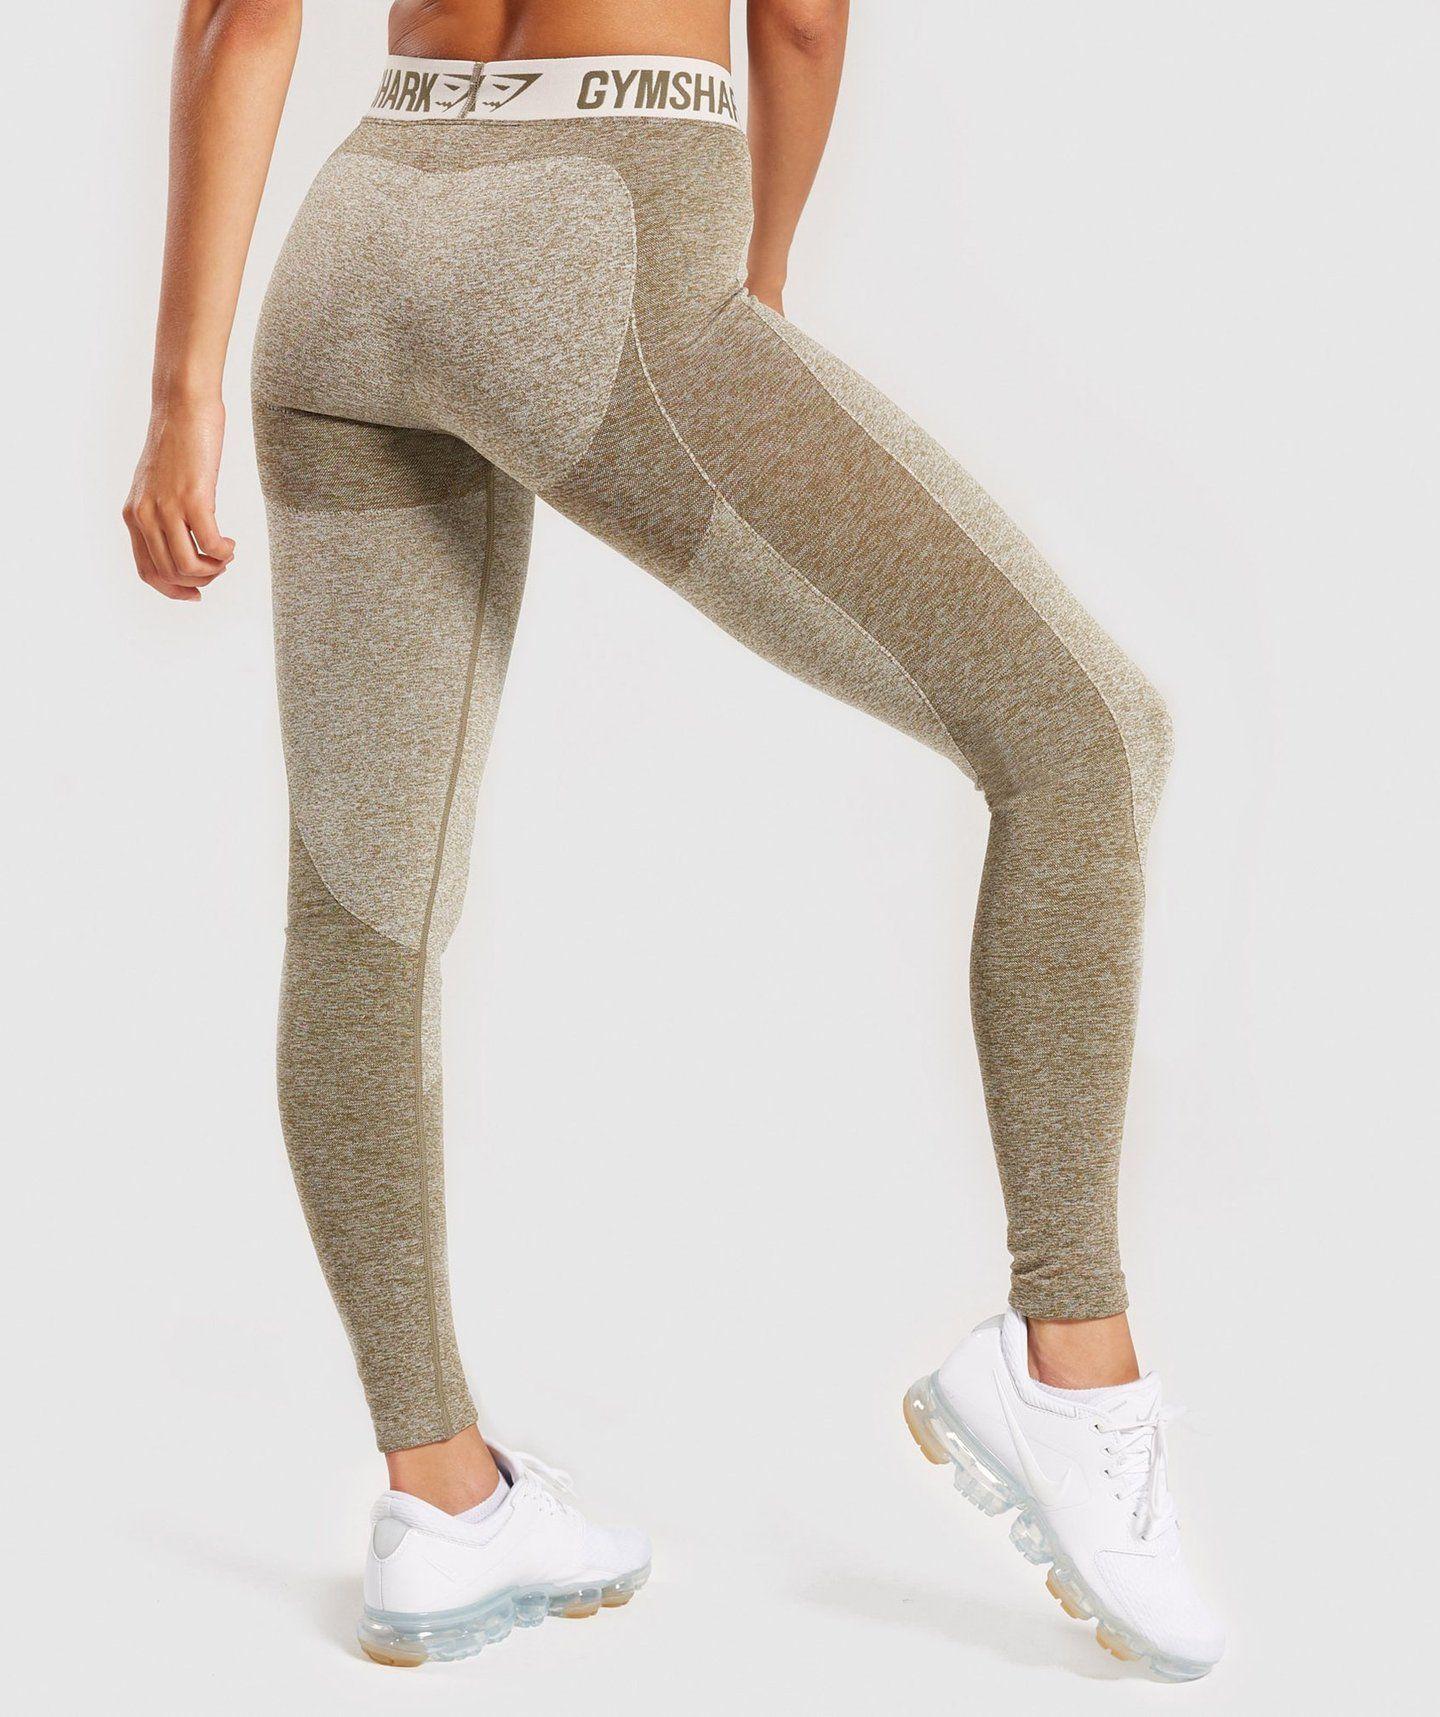 6fd33f8c0511d Gymshark Flex Leggings - Khaki/Sand 4 | Workout Clothing | Gymshark ...